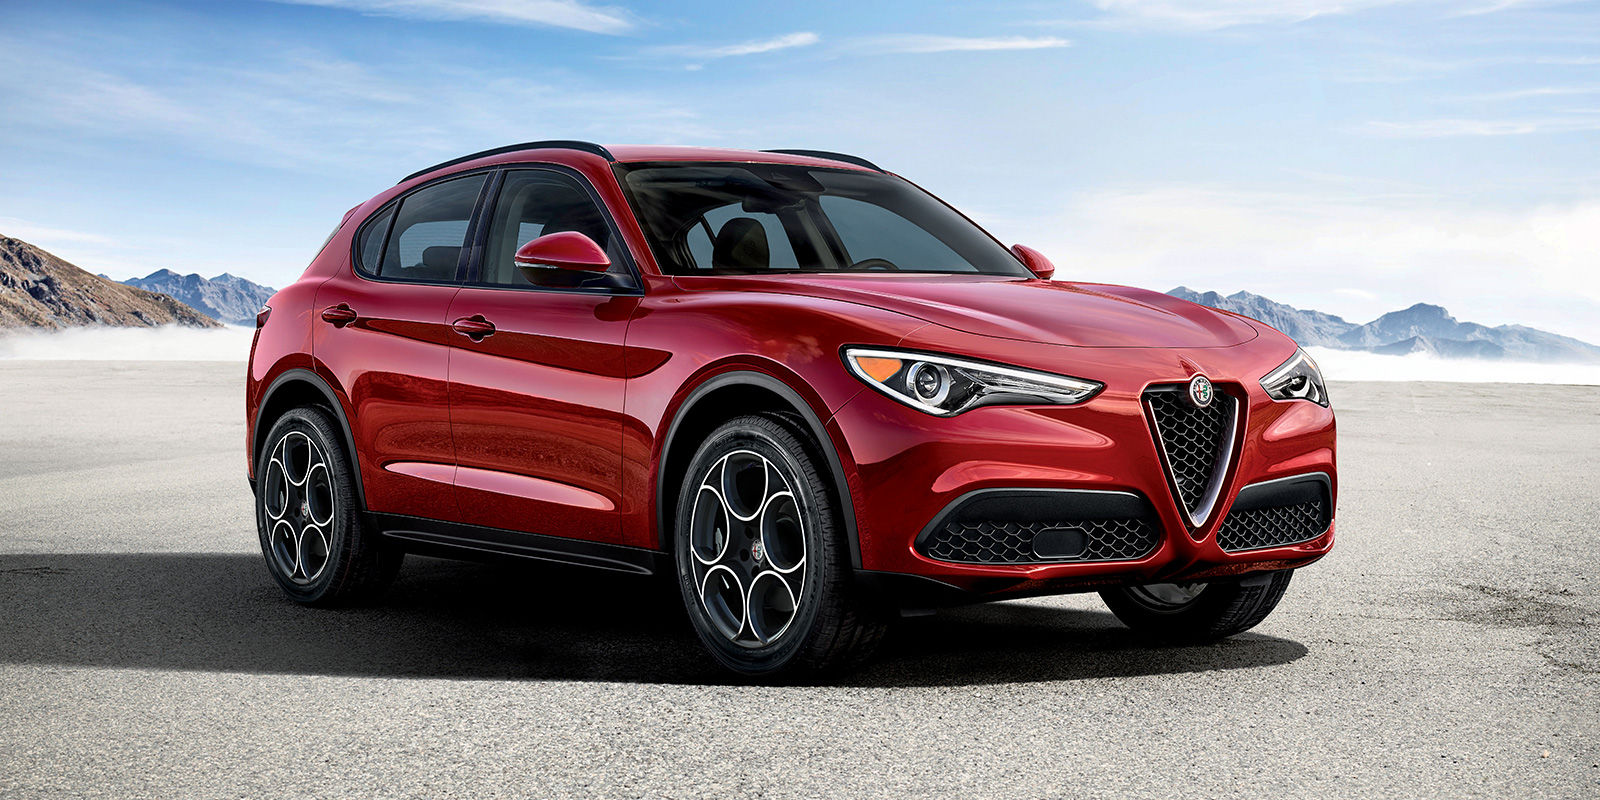 2018 Alfa Romeo Stelvio Red Front Exterior